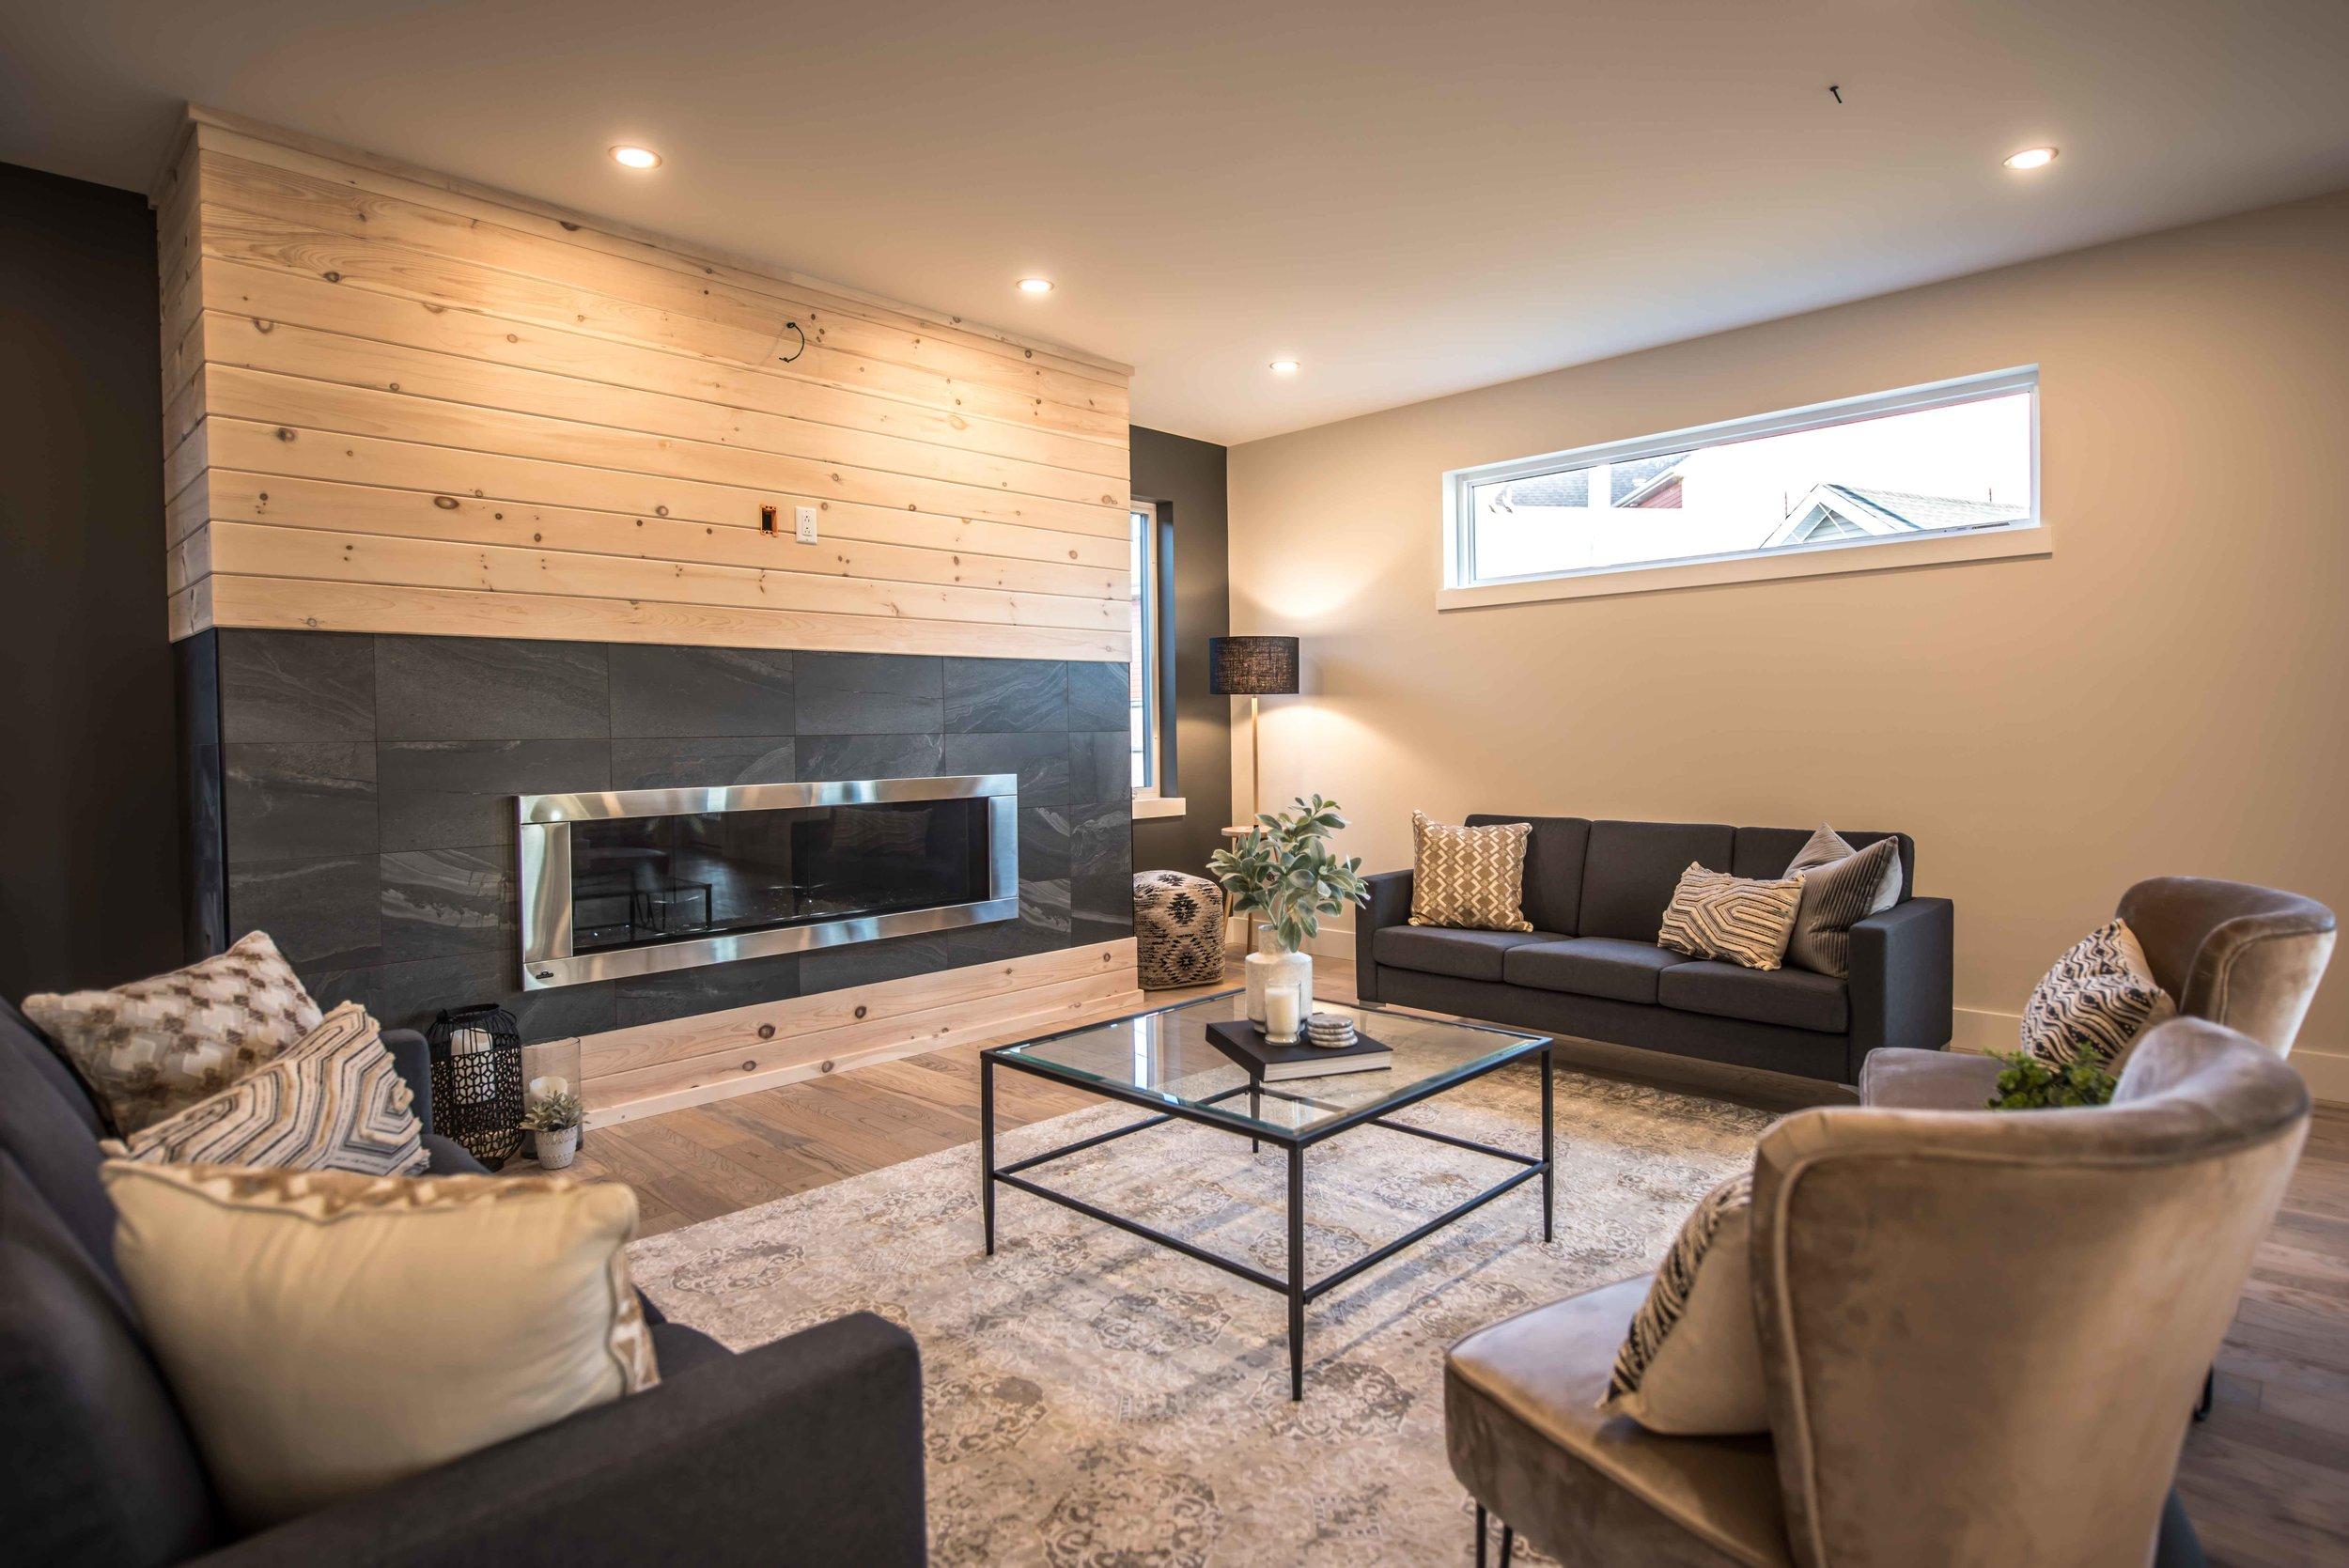 Cooper Quality - Dunkerry Living Room 2.jpg